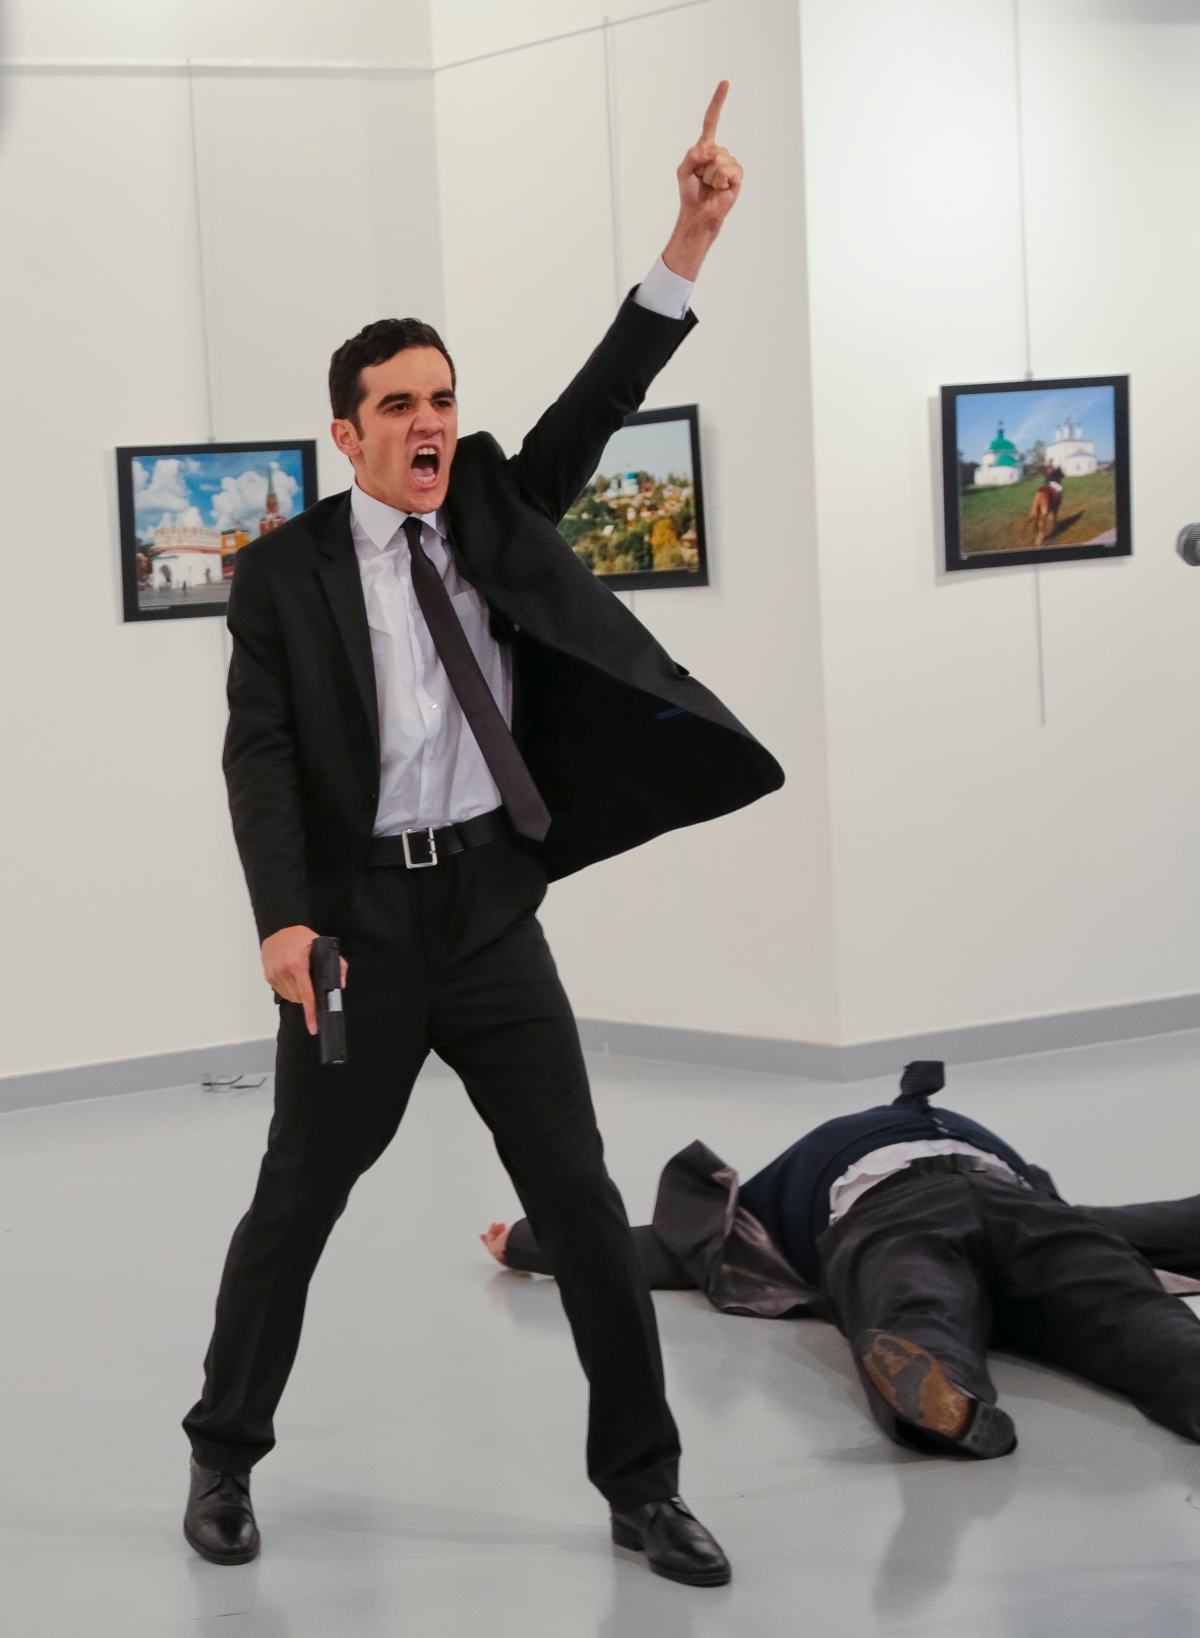 Burhan Özbilici / AP Images